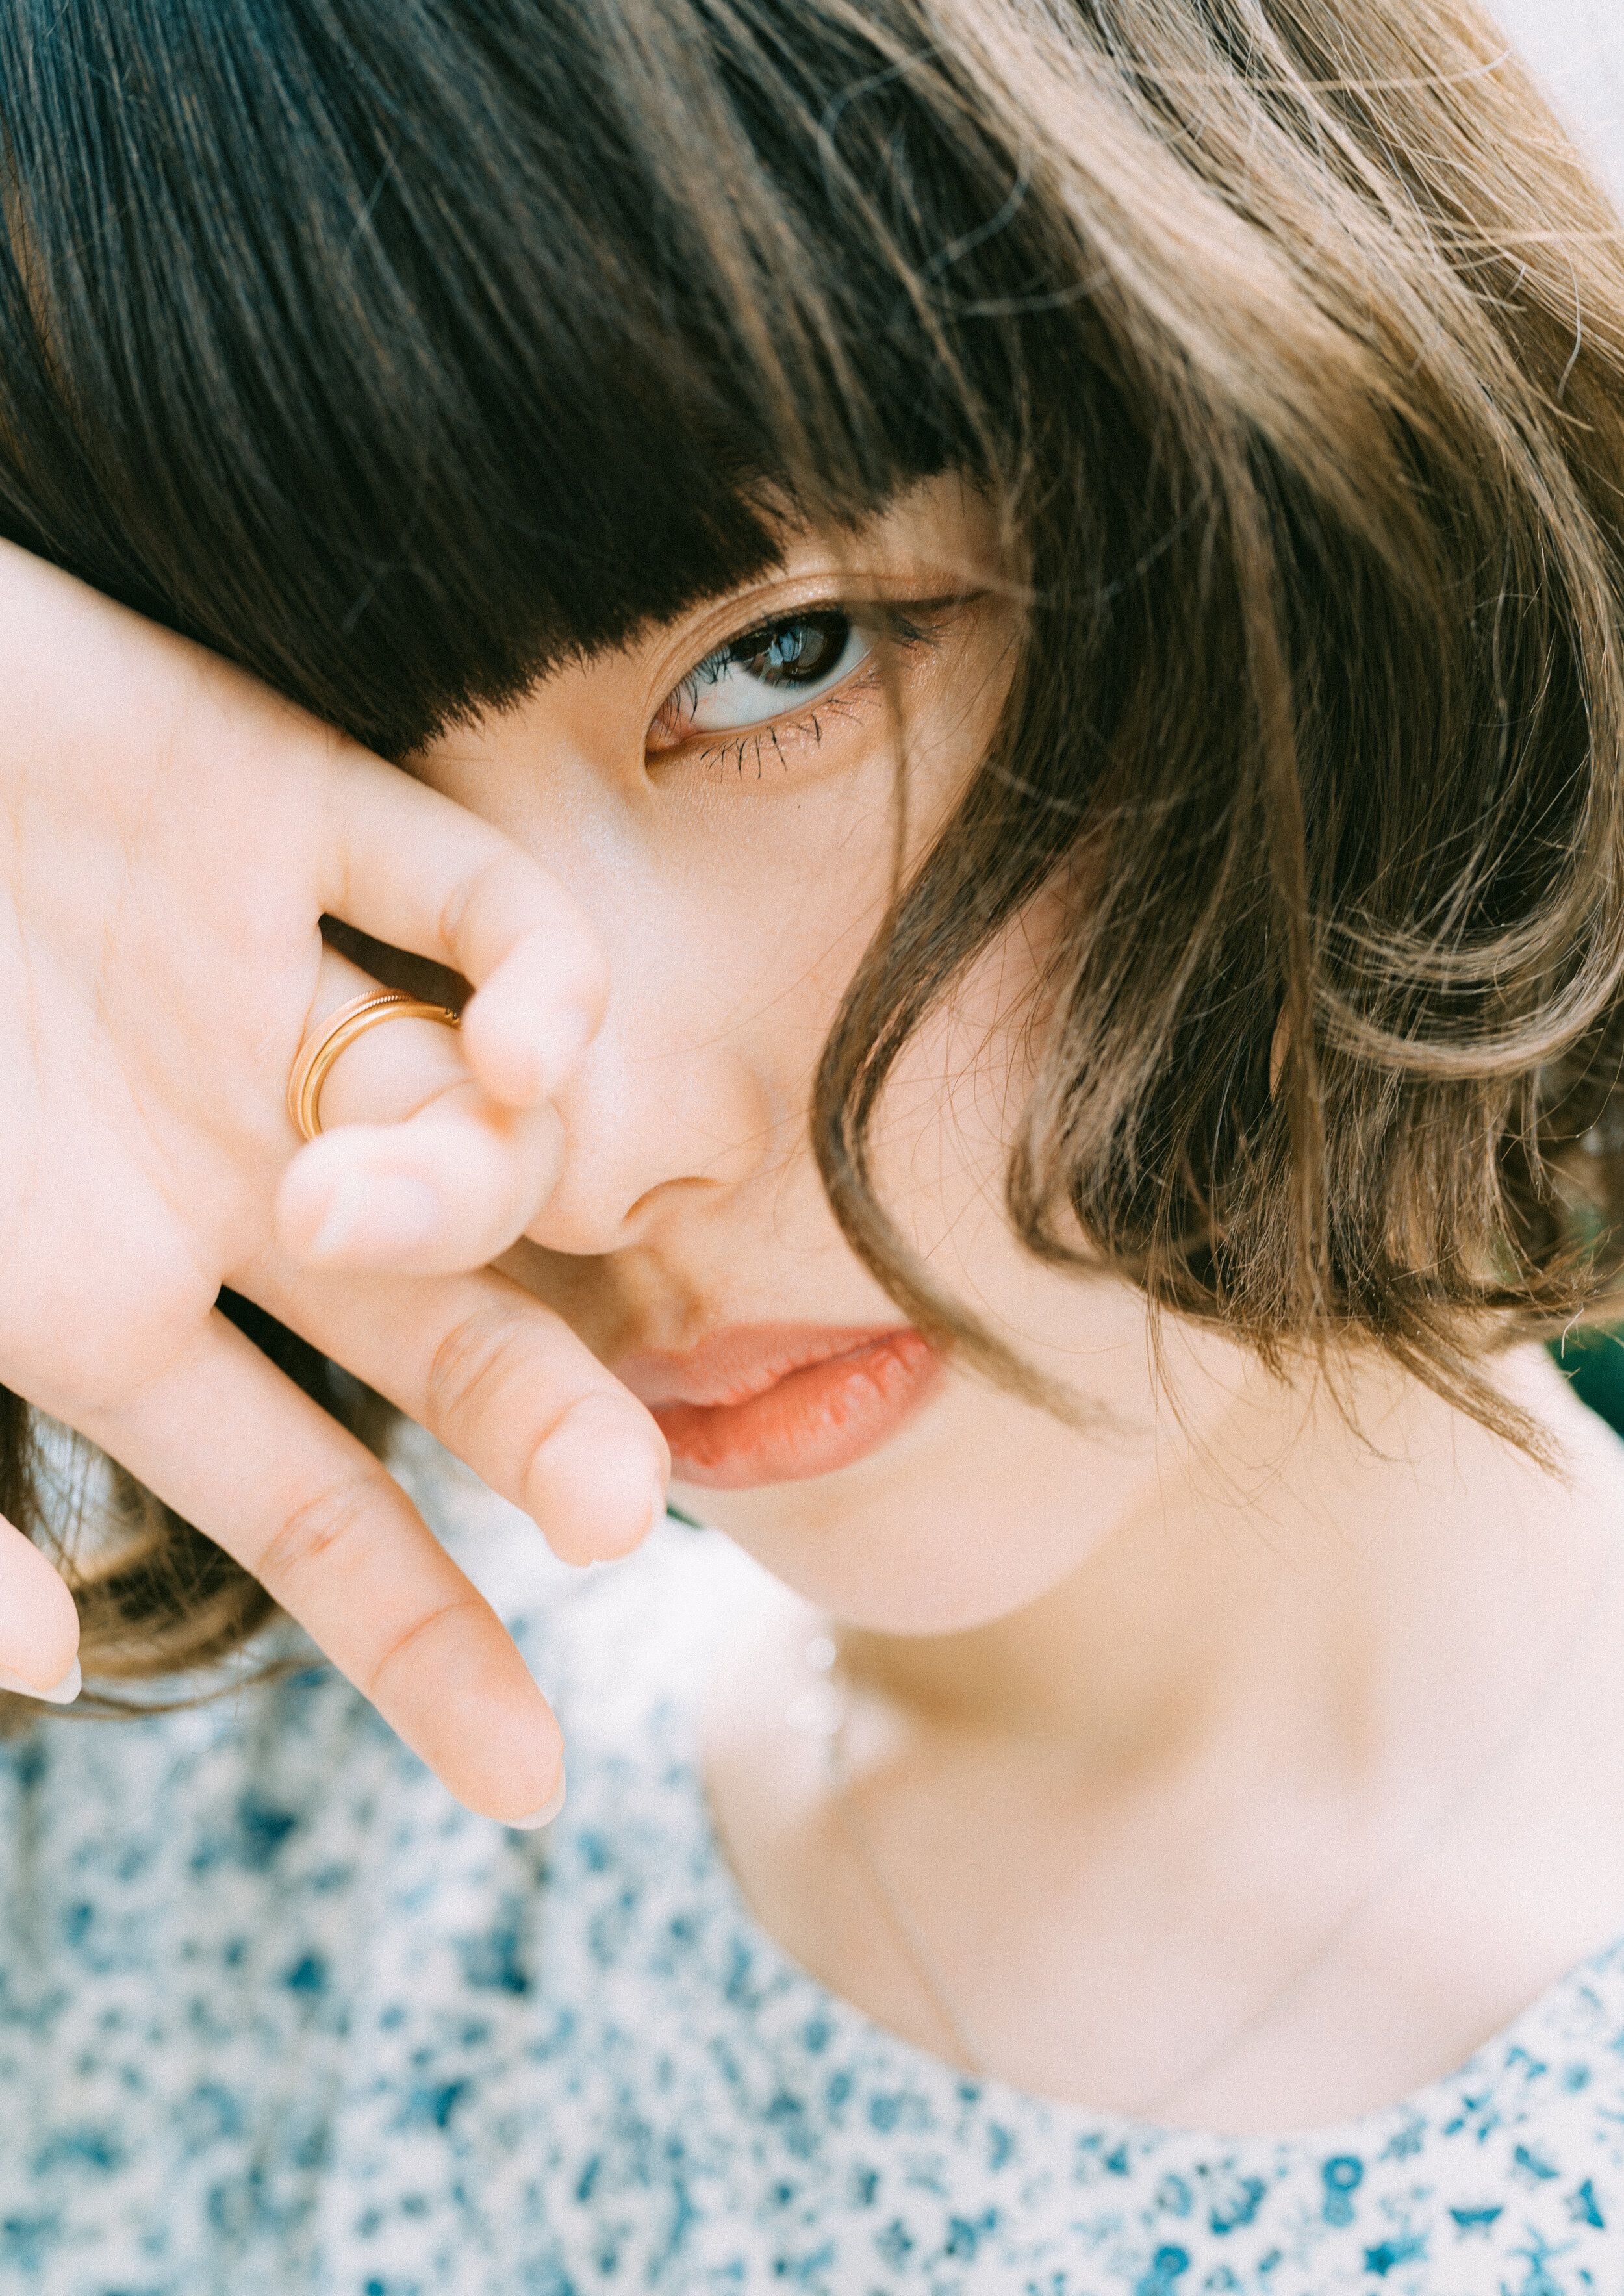 Portrait Sakai Takahiro In 2020 Portrait Model Poses Photography Hair Photography